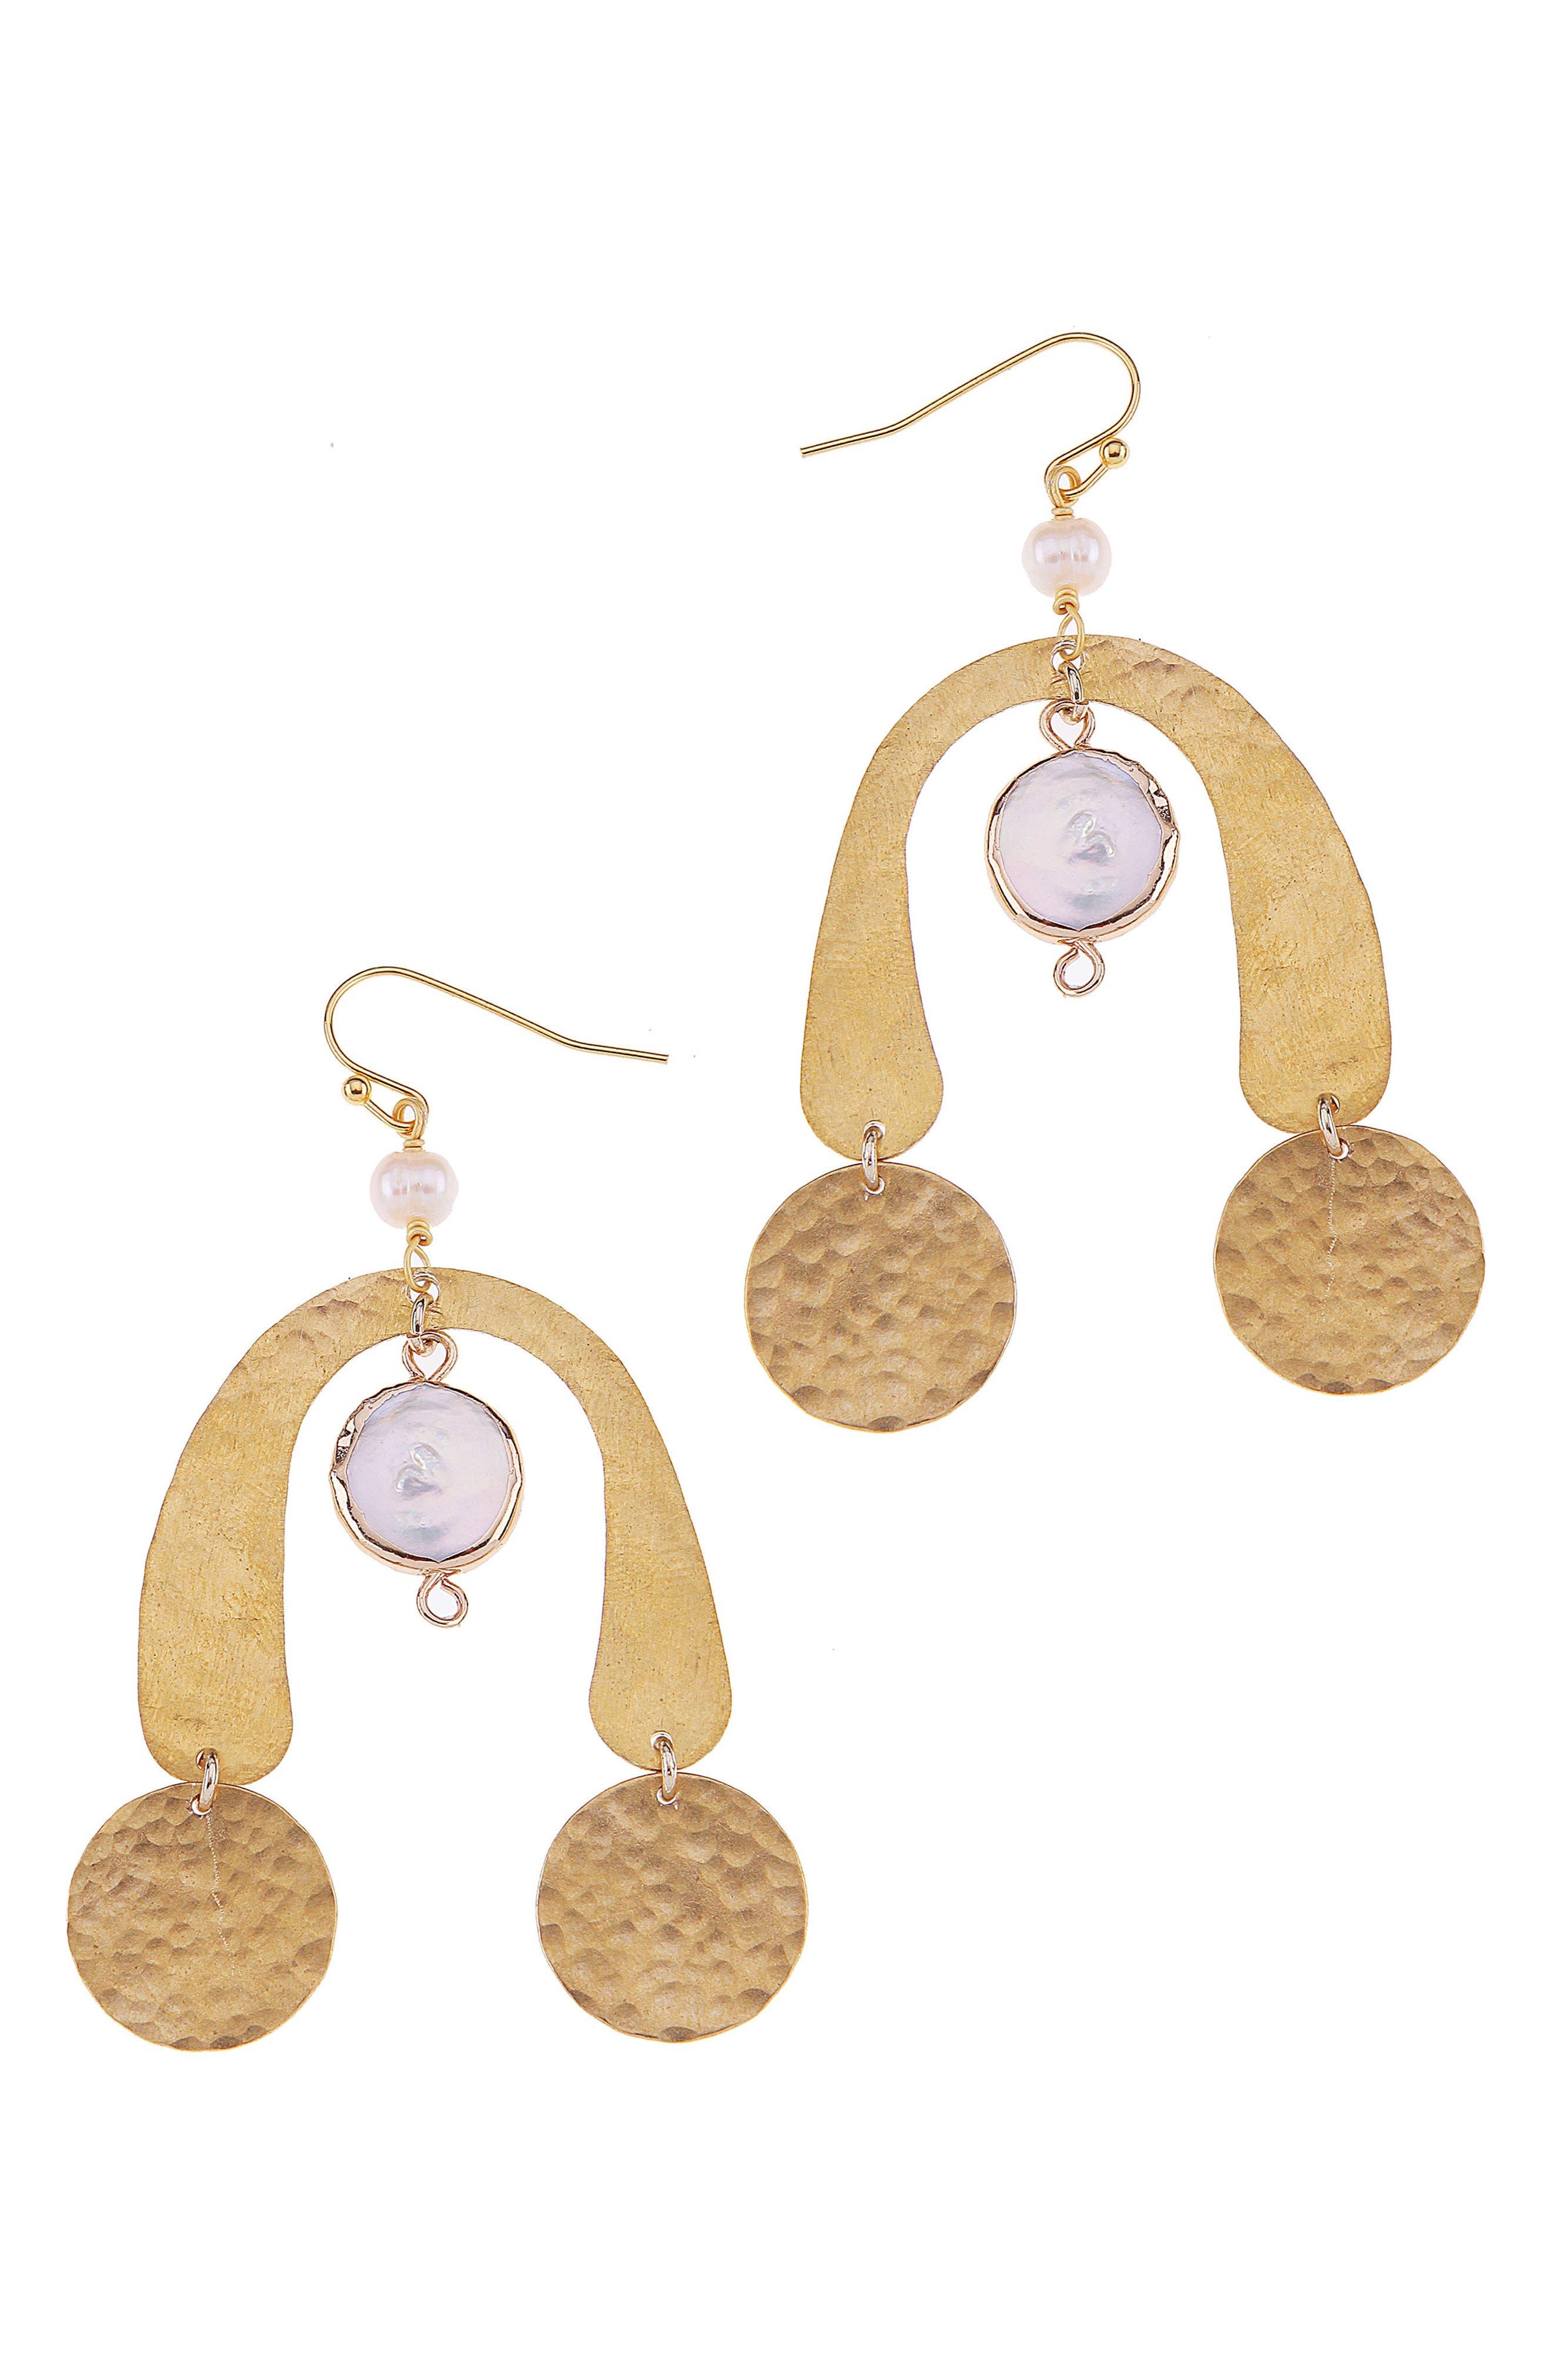 Main Image - Nakamol Design Brass Coin & Freshwater Pearl Statement Earrings